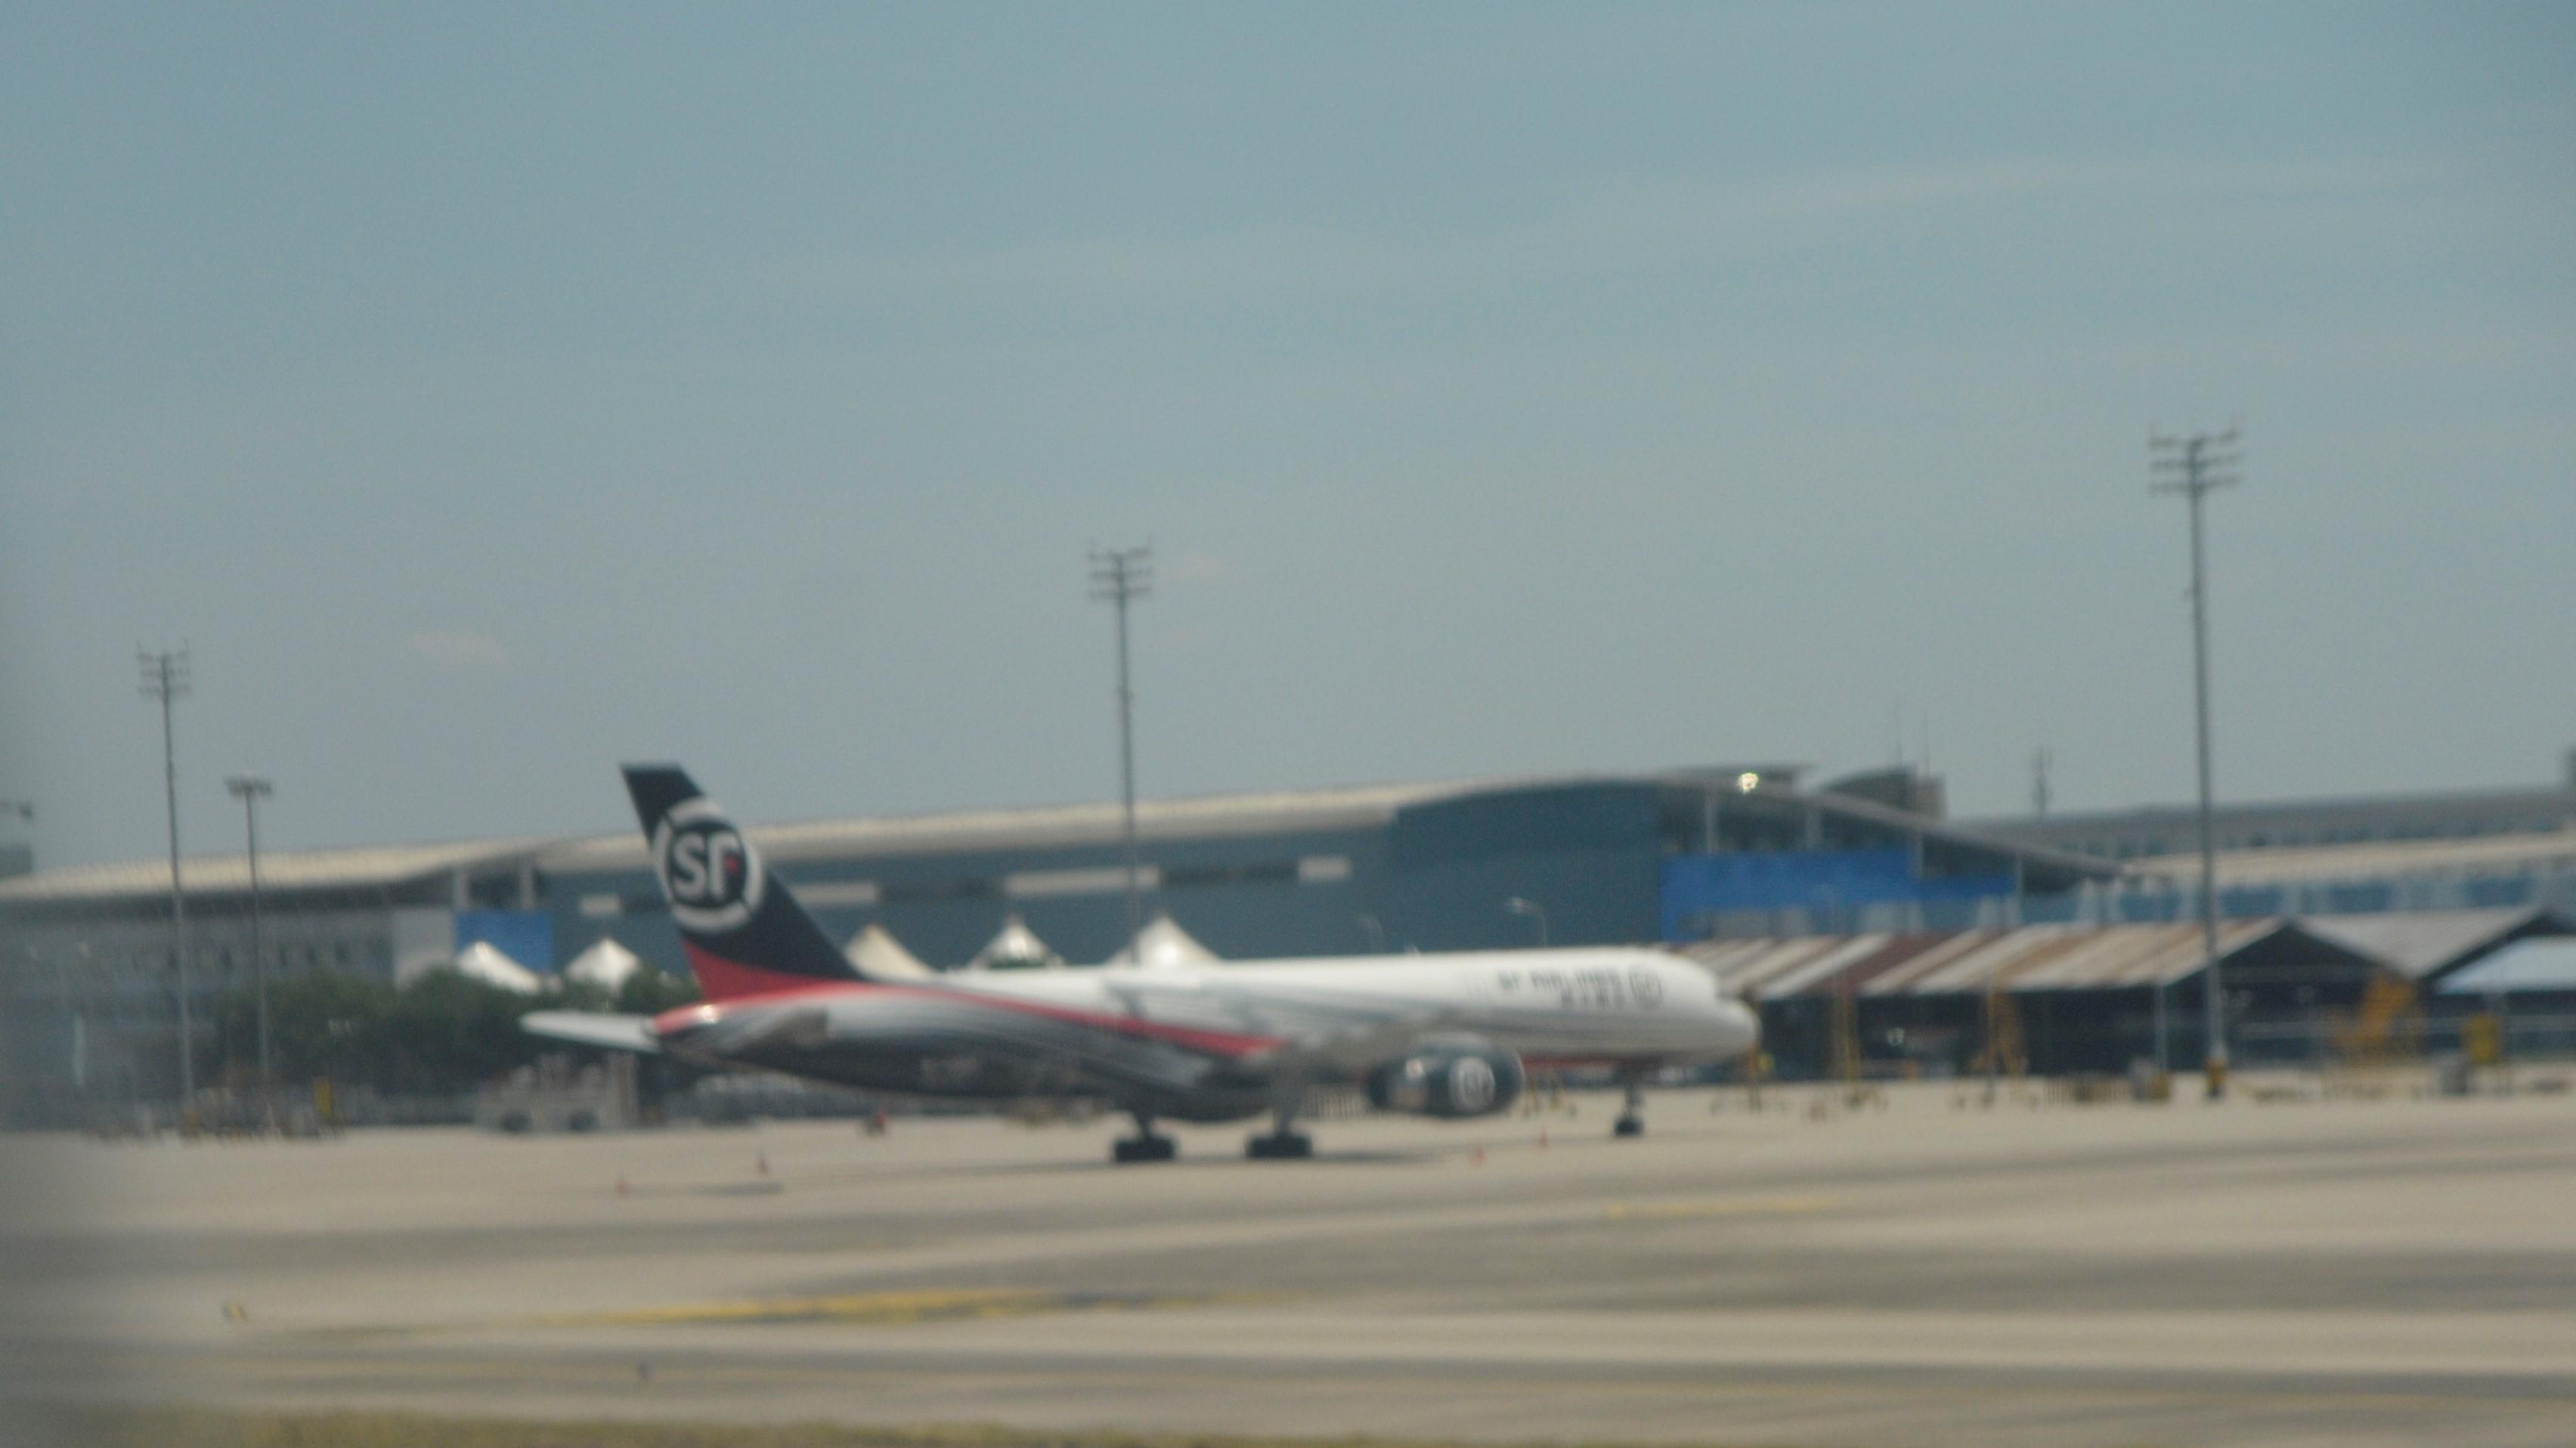 Re:[原创]Kian的飞行游记2:金陵2日游,B787返回广州 BOEING 757-200F